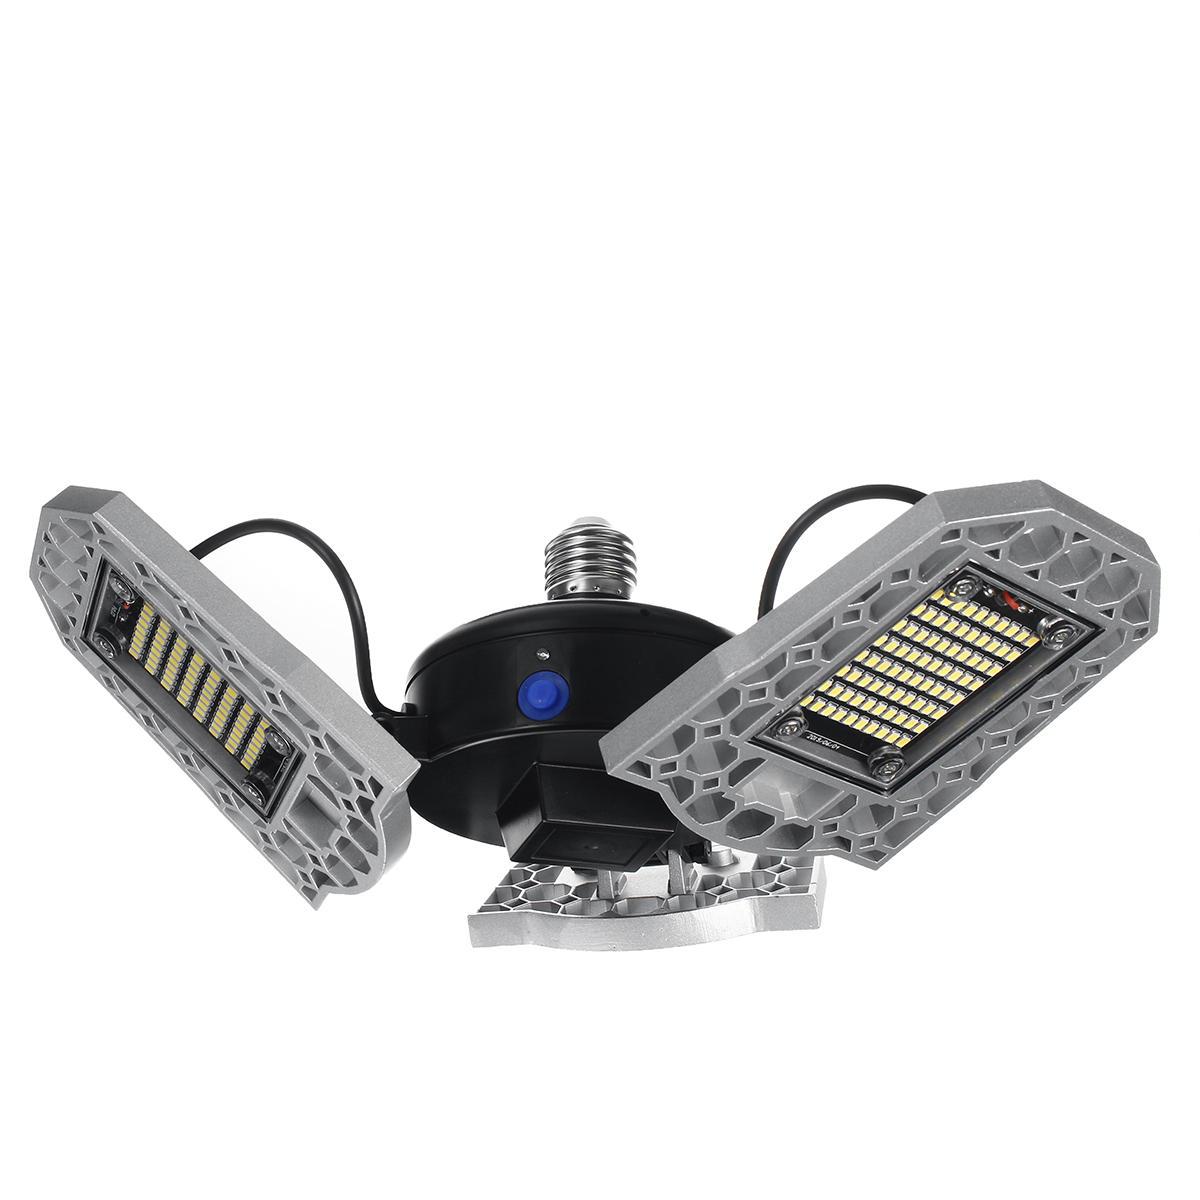 E27 Football LED Light Bulb 60W 80W 100W 120W Warm White Workshop Folding Garage Ceiling Lamp 100-277V - 2